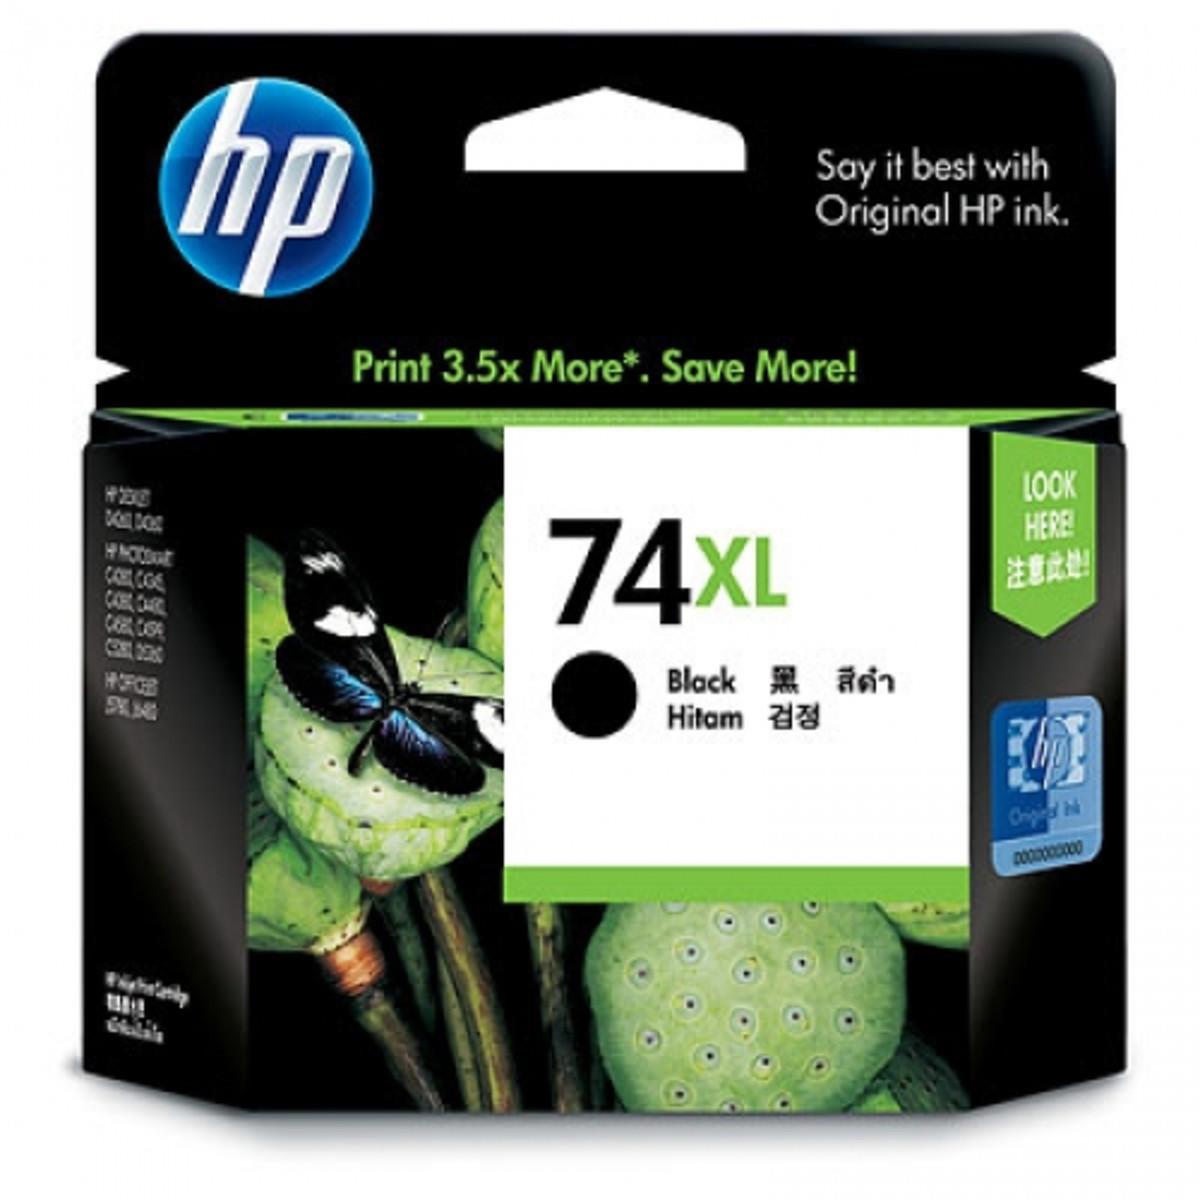 HP 74XL (CB336WA) Black Ink Cartridge - High Yield